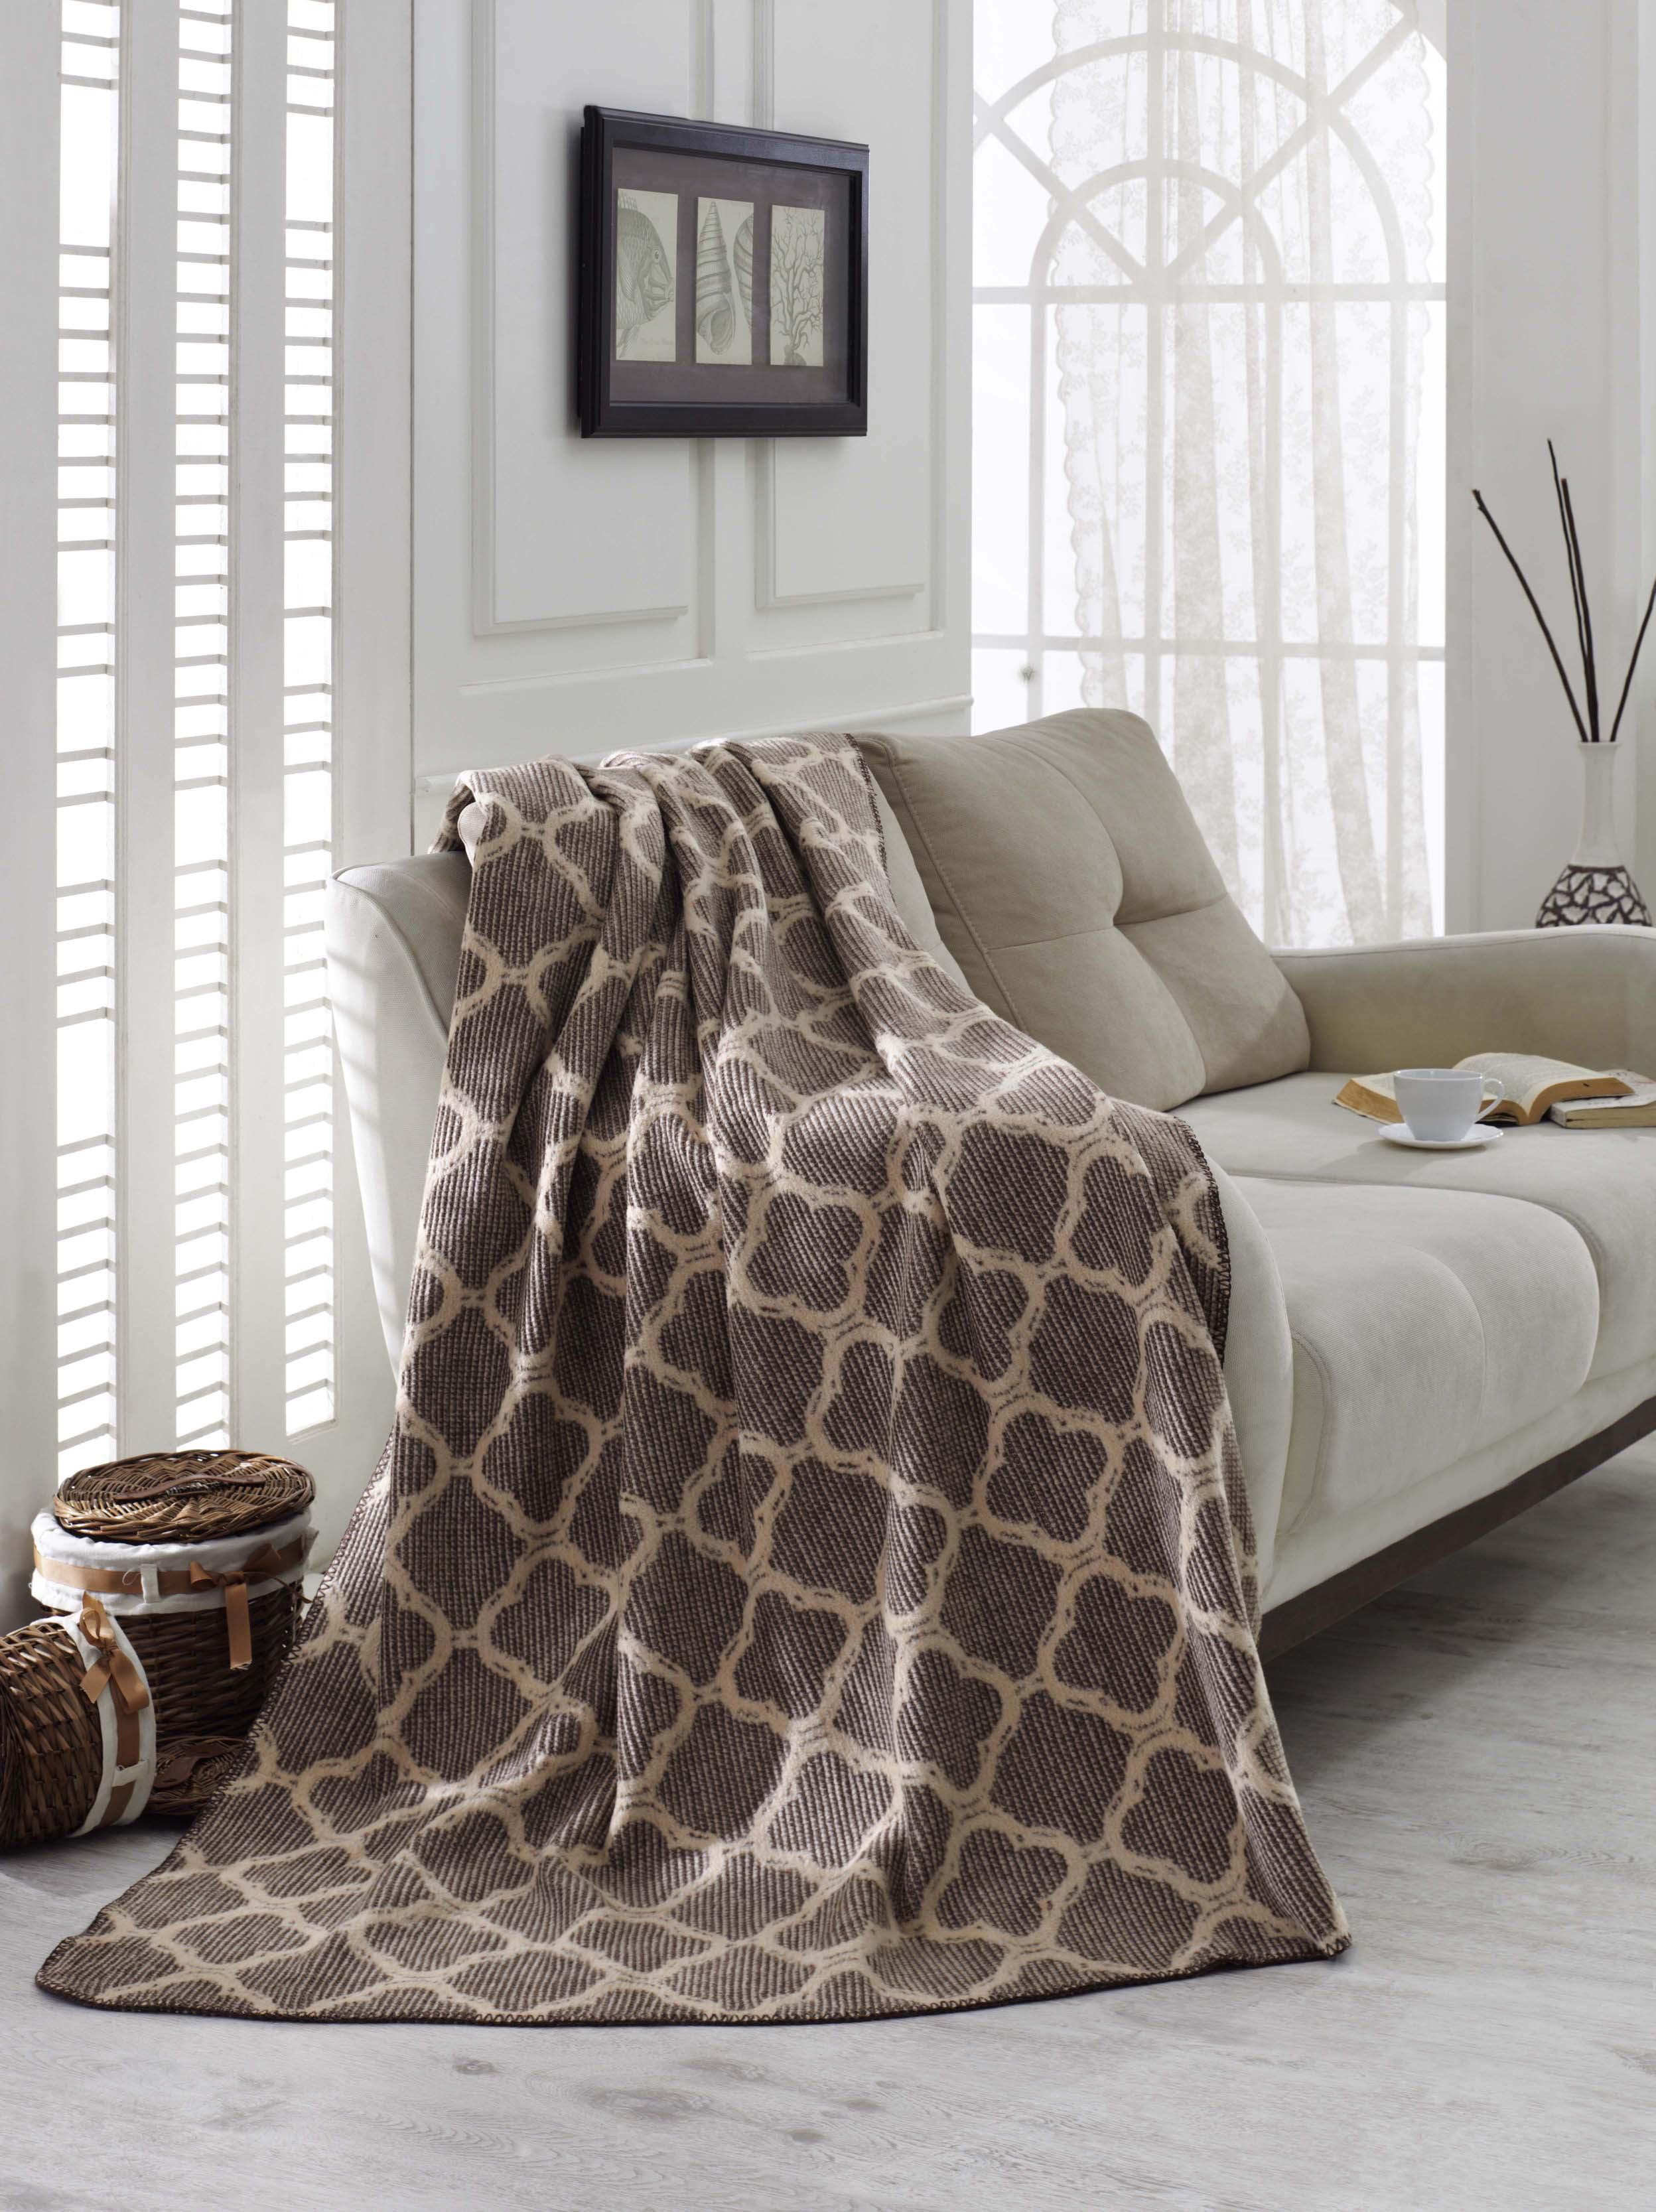 Ottomanson Plush Soft Cotton Reversible, Striped, Solid and Trellis Fleece Throw Blankets,... by Ottomanson